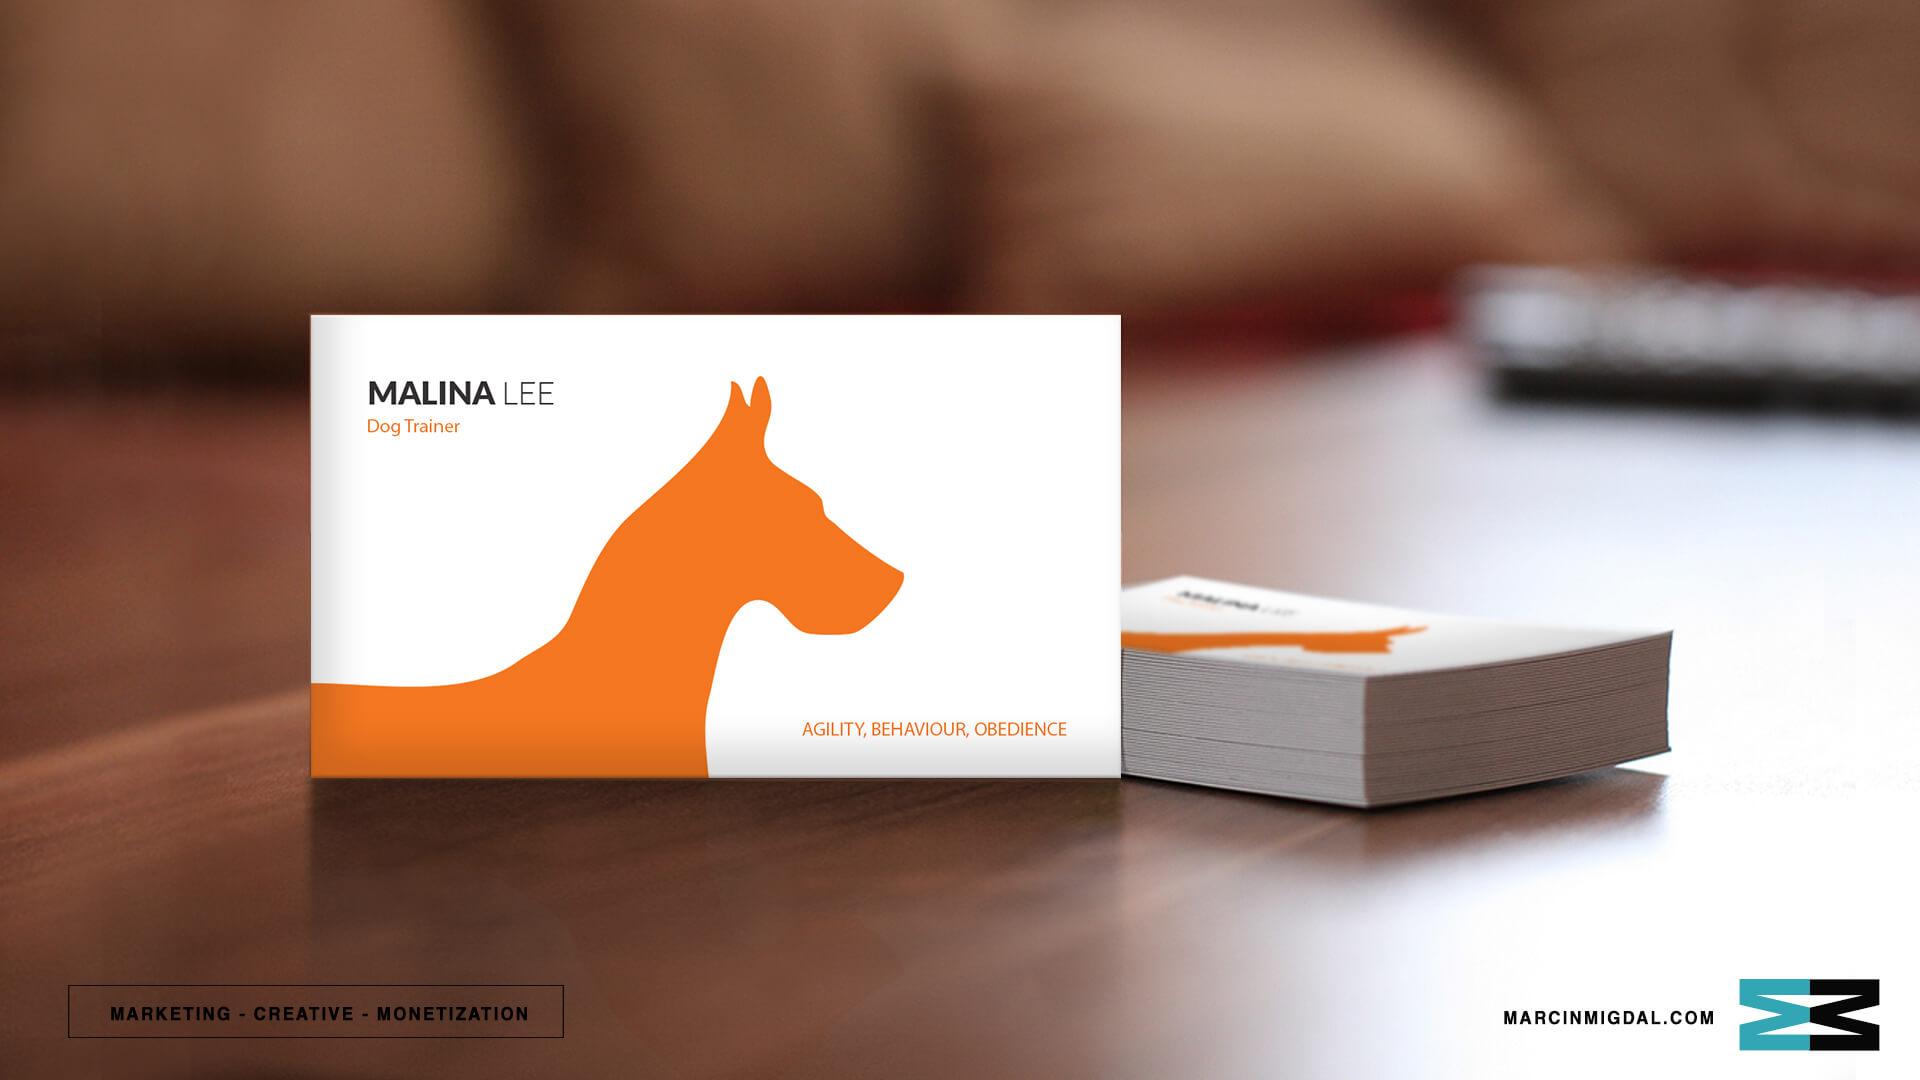 Dorable dog training business cards elaboration business card fantastic dog training business cards sketch business card ideas colourmoves